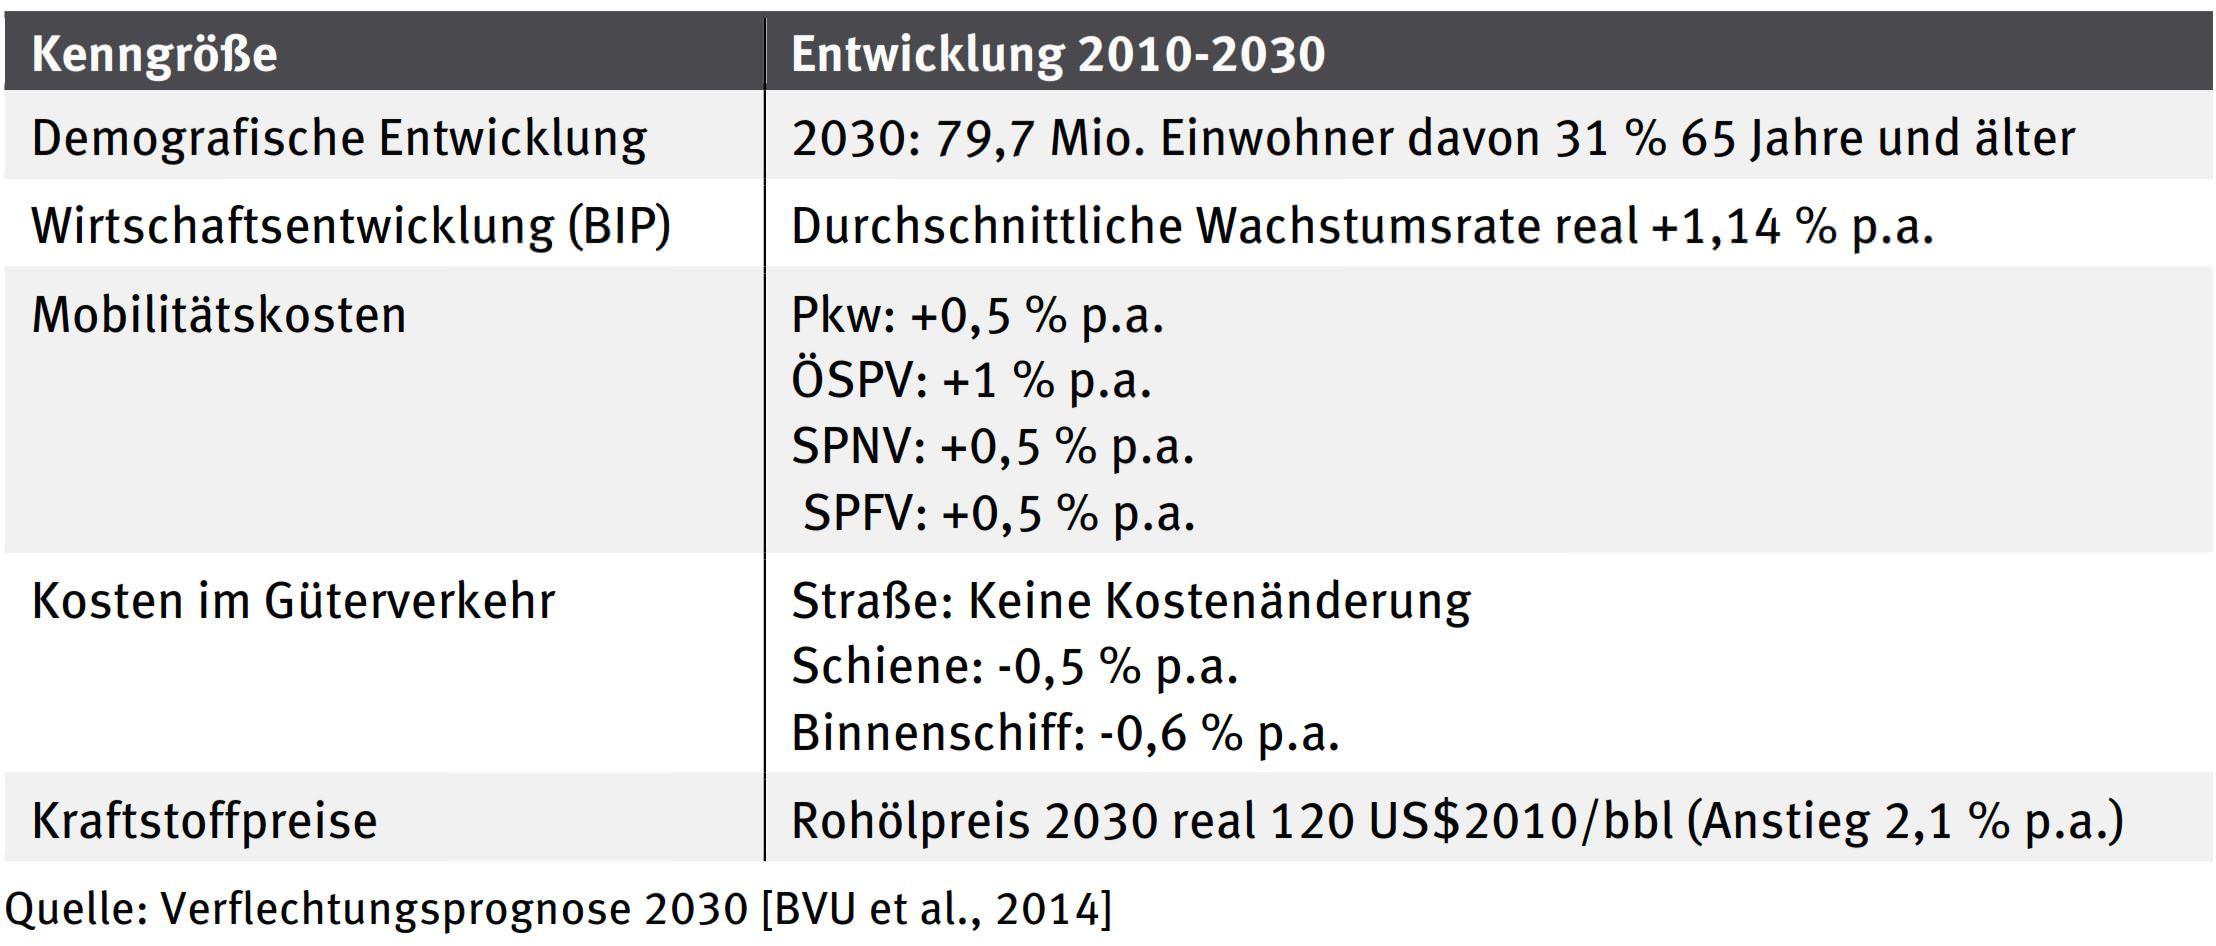 BVWP Verflechtungsprognose 2030 Annahme